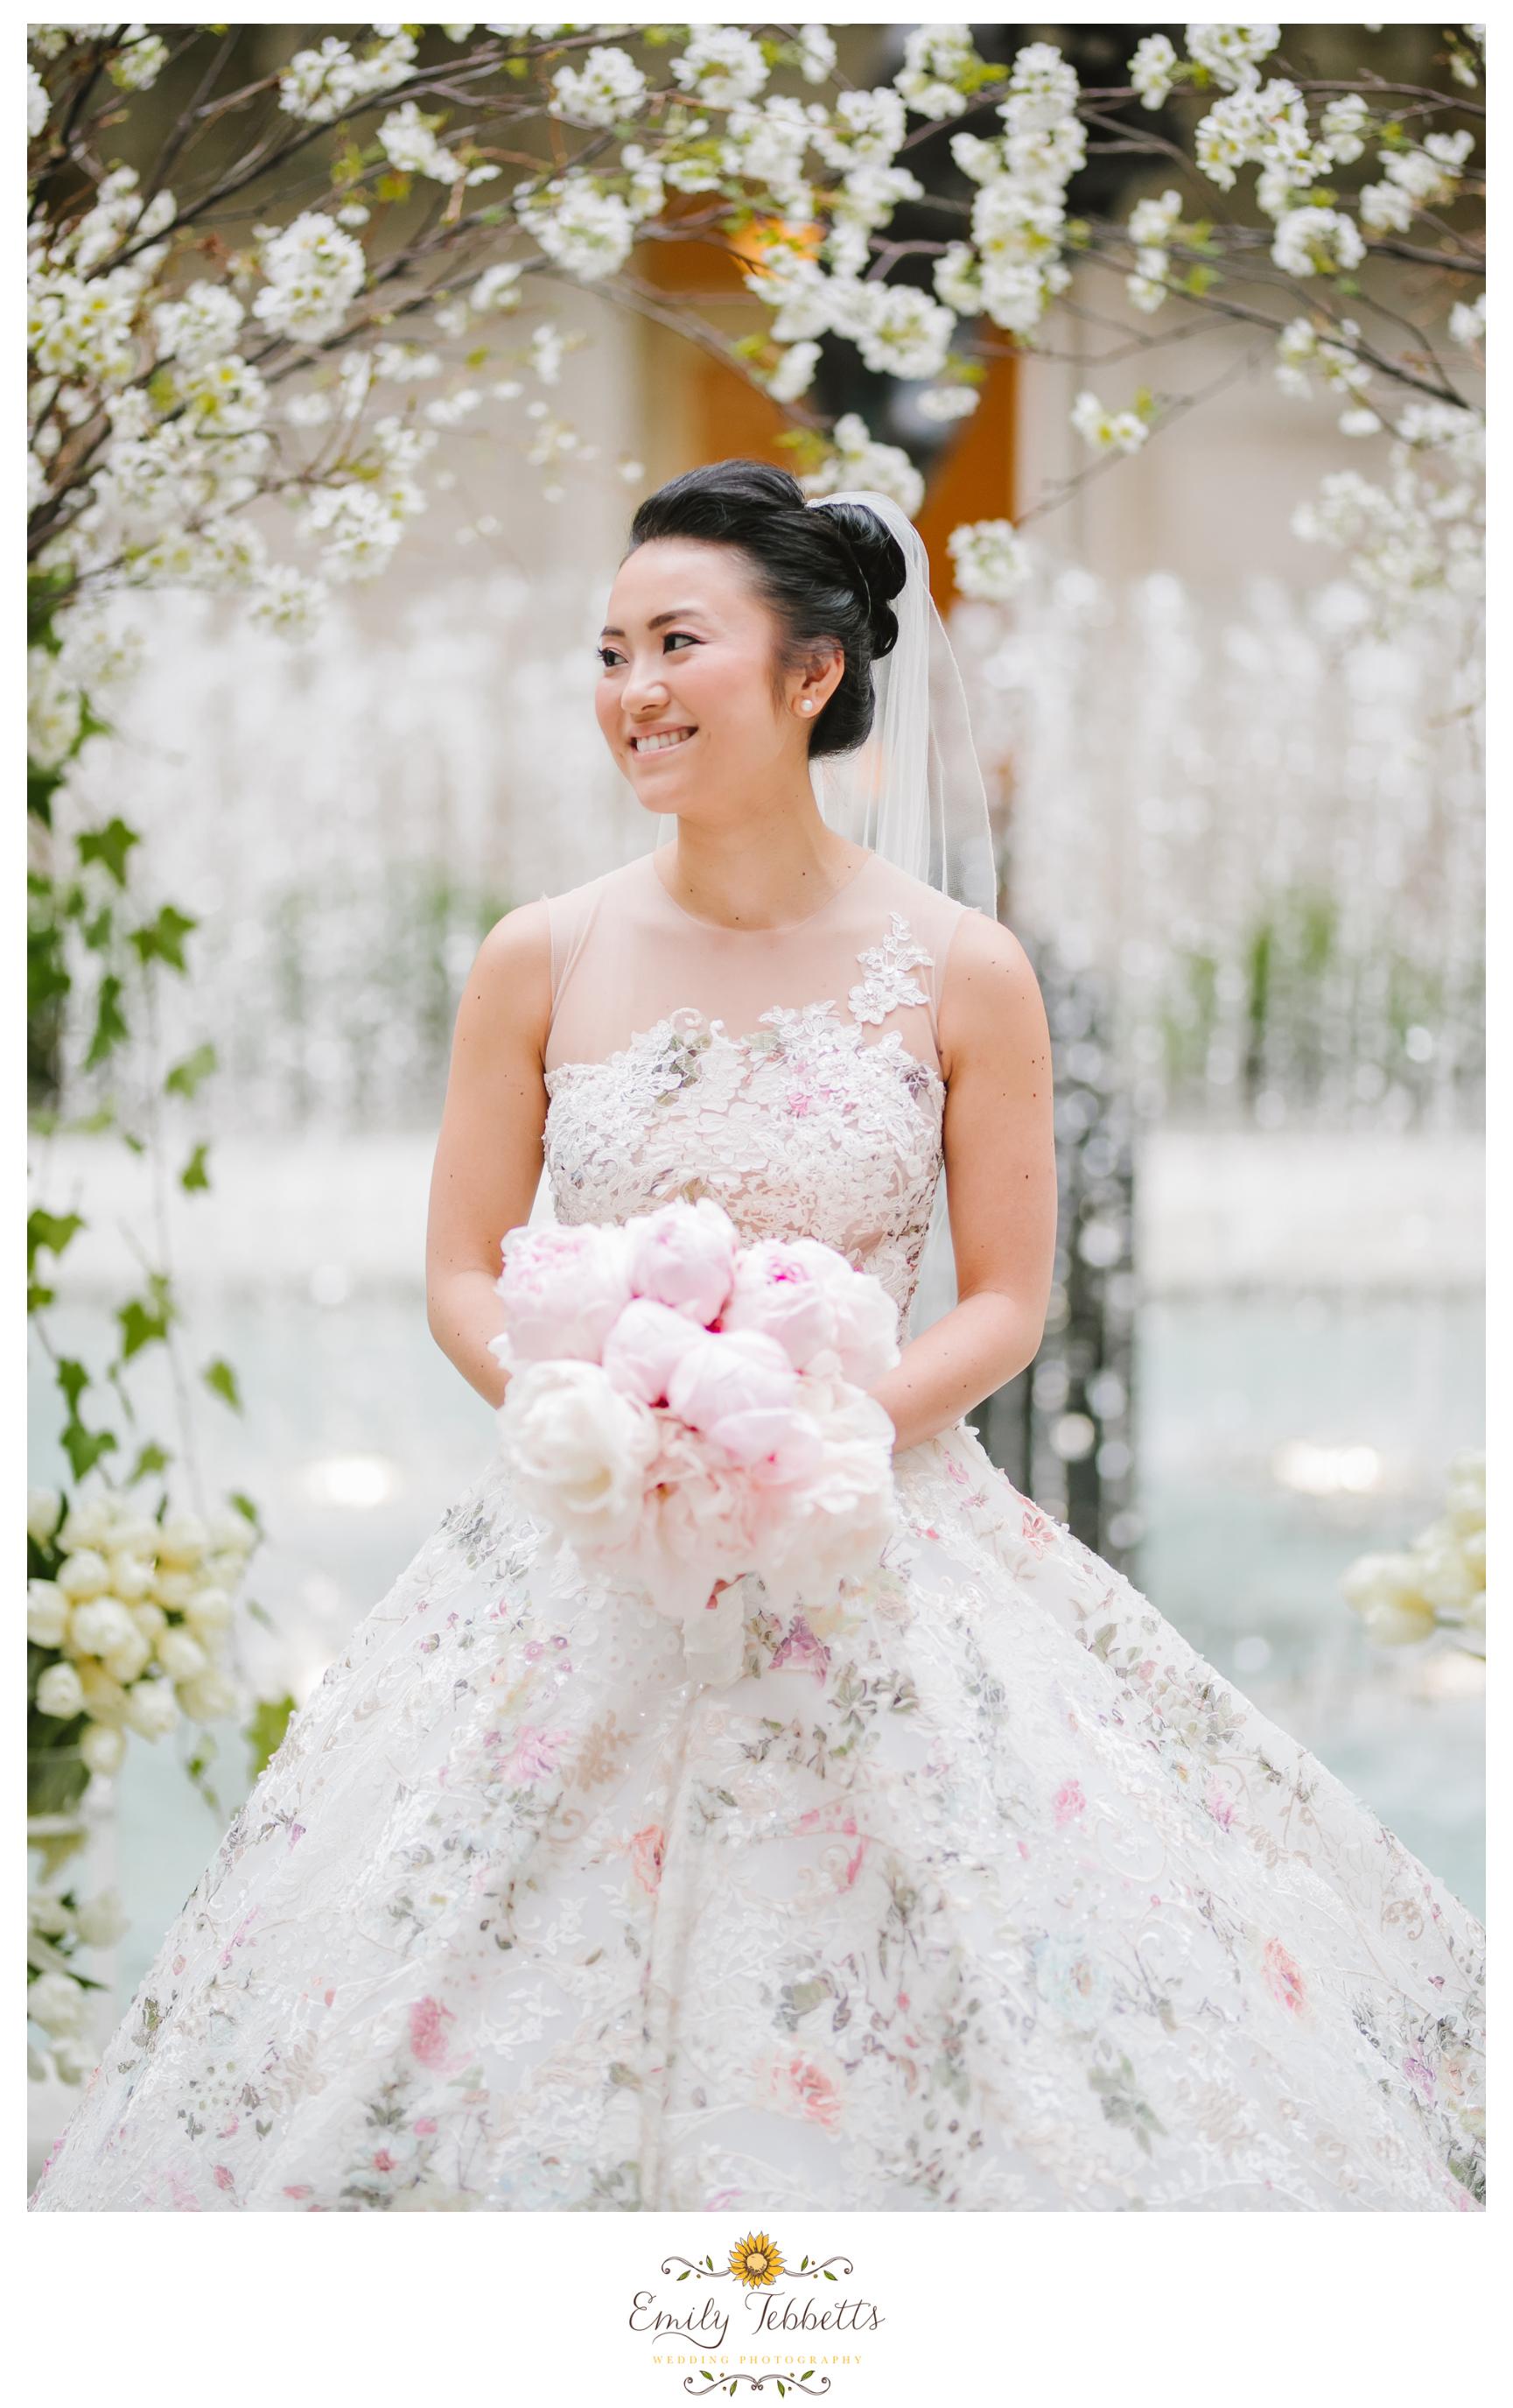 Boston Public Library BPL Wedding Emily Tebbetts Photography - Kaori + John-7.jpg